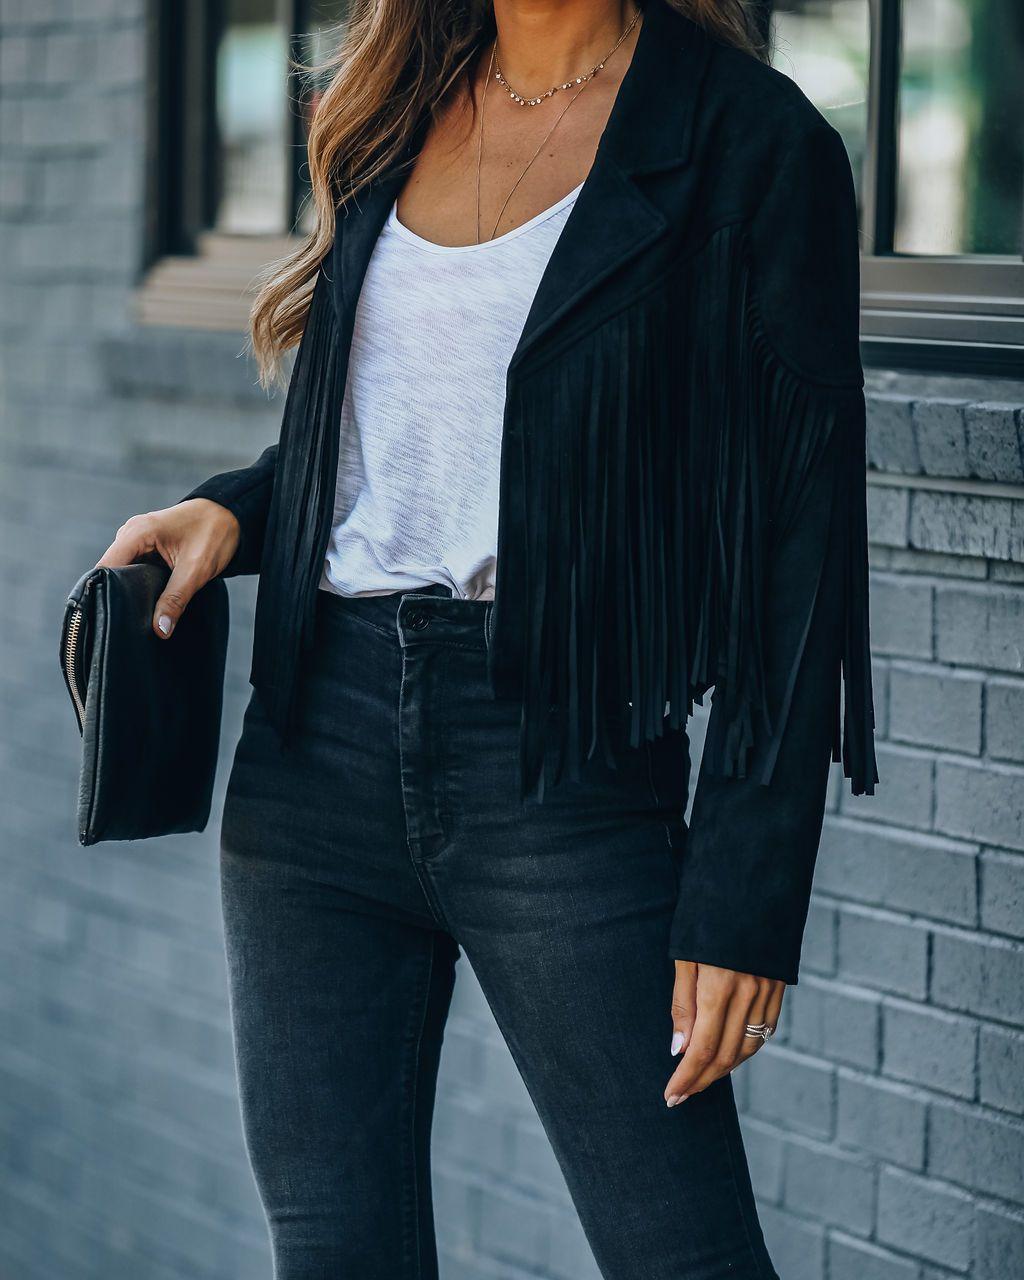 H28f3d022dea941d98c6c88736bf231e9s Fringed Bomber Jacket Women Spring Fashion Long Sleeve Turn-down Collar Open Stitch Slim Jackets